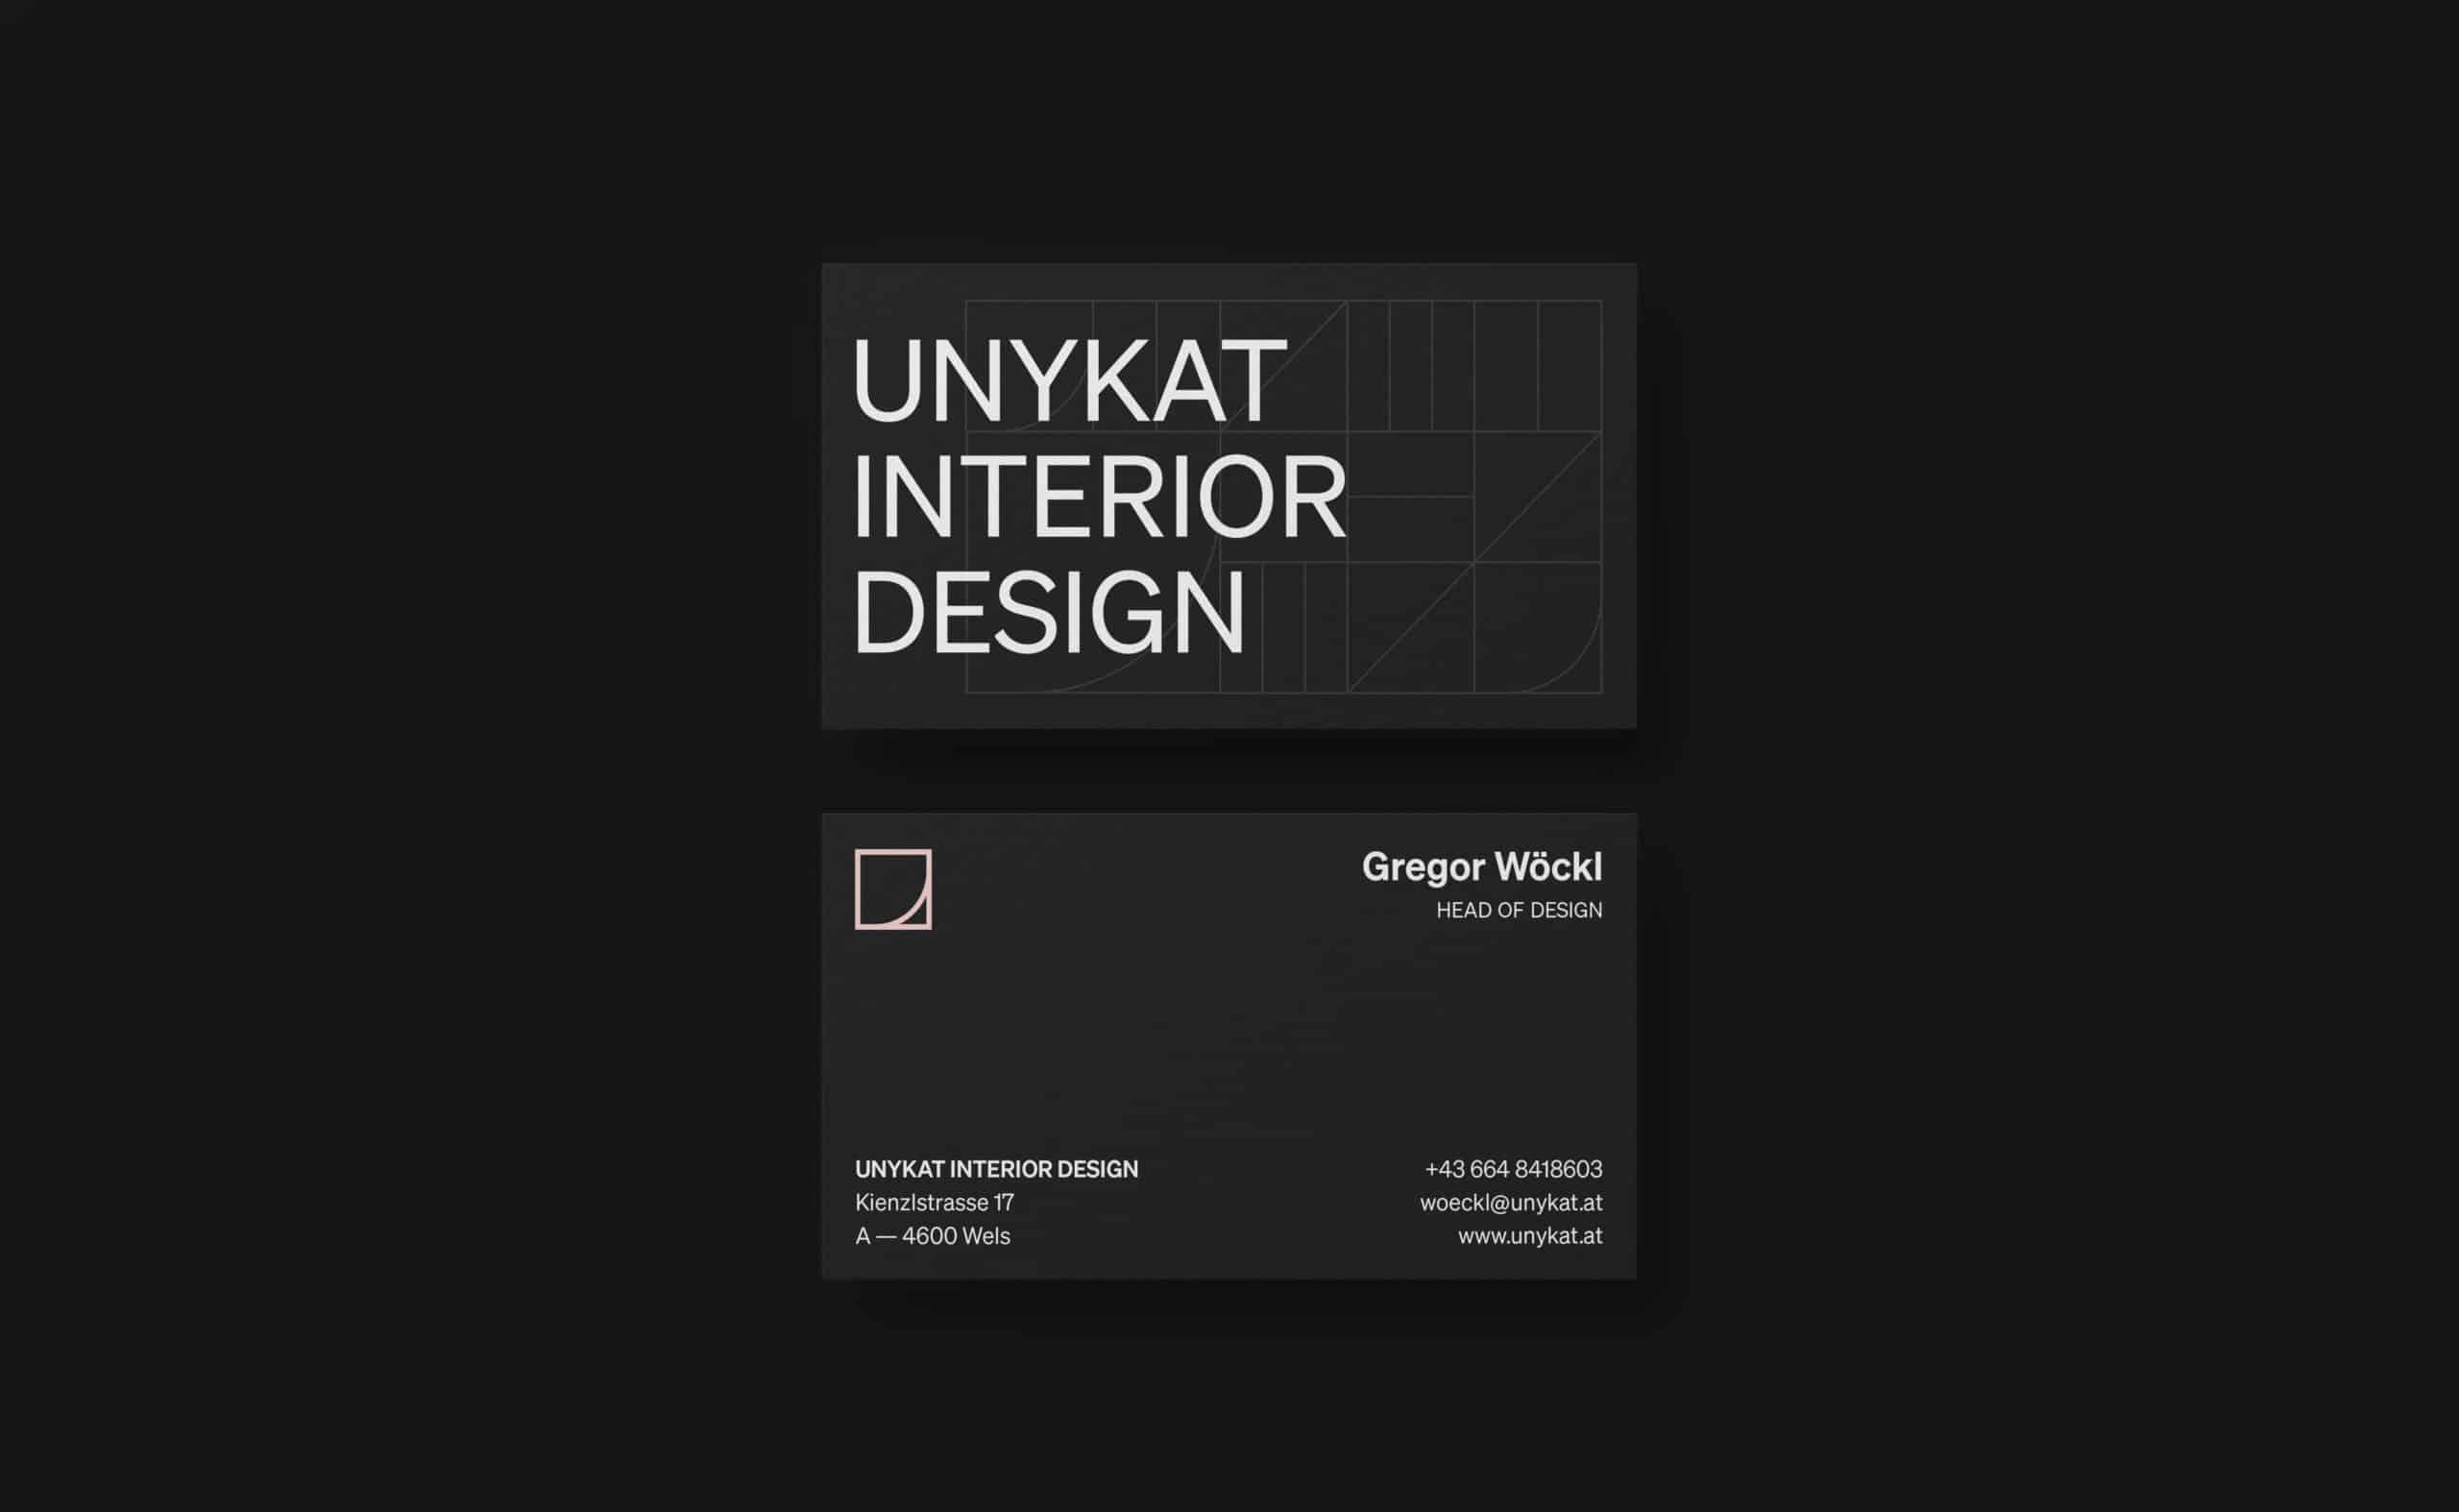 unykat_vk_90x50_showcase_lay-10